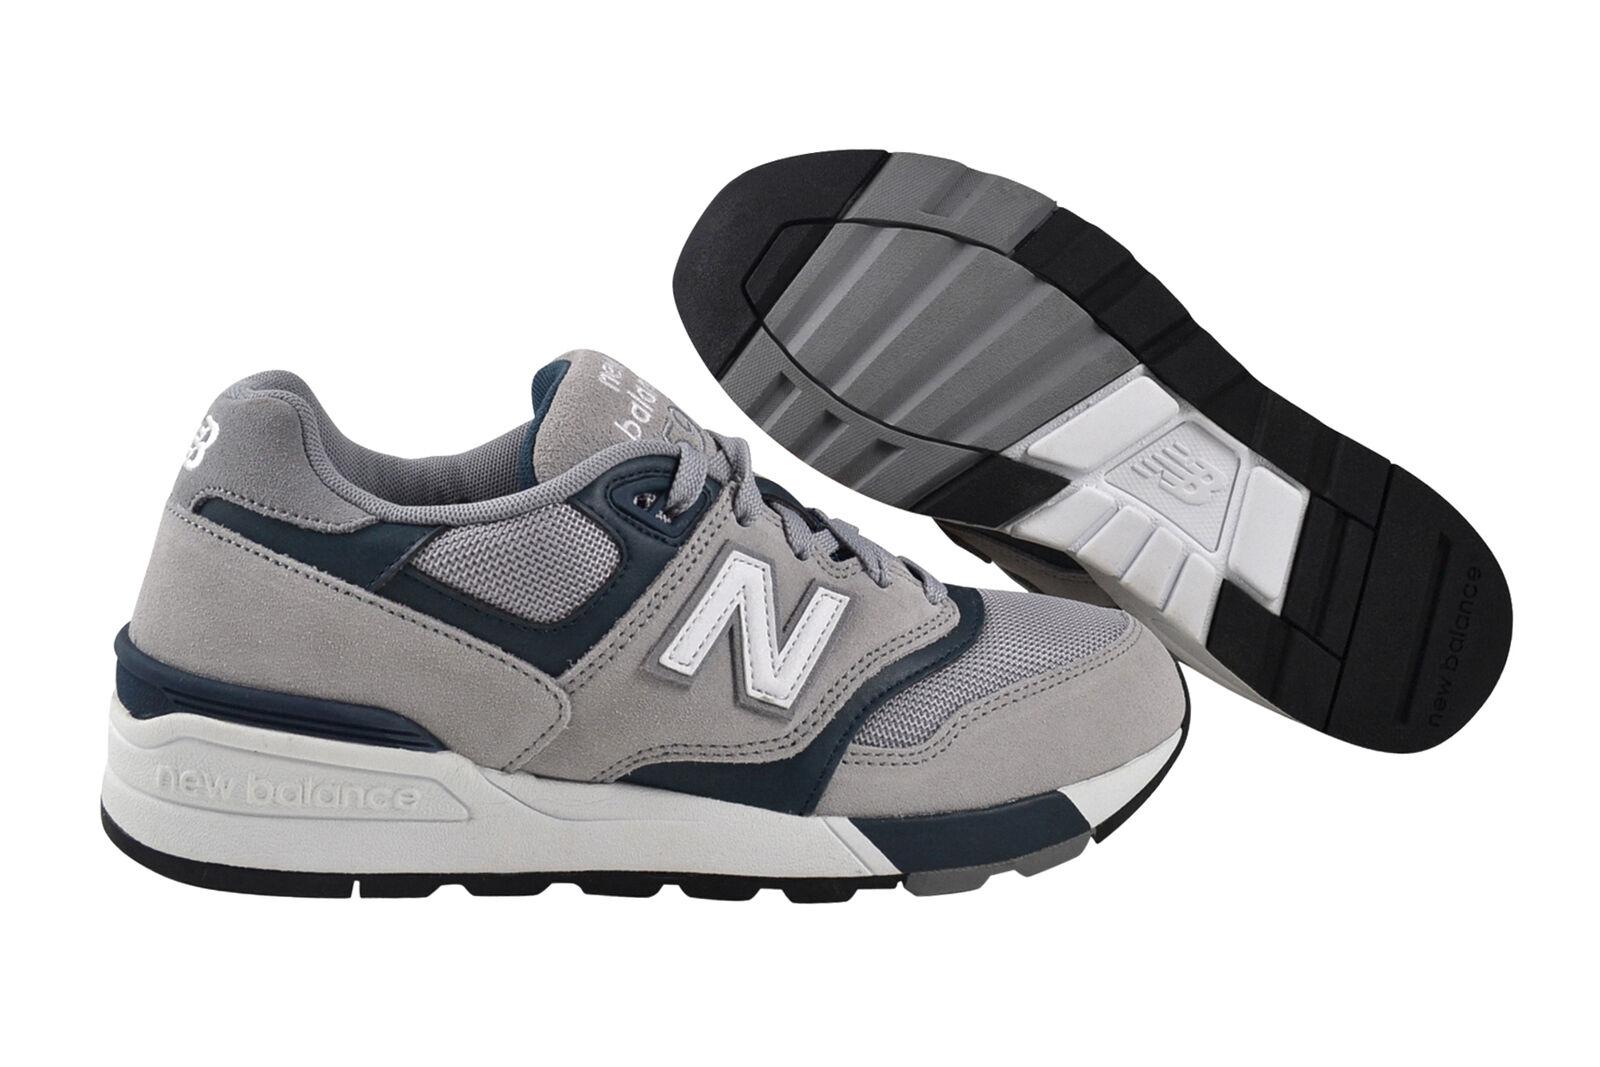 New Balance ML597 GSC grey teal Schuhe Sneaker grau